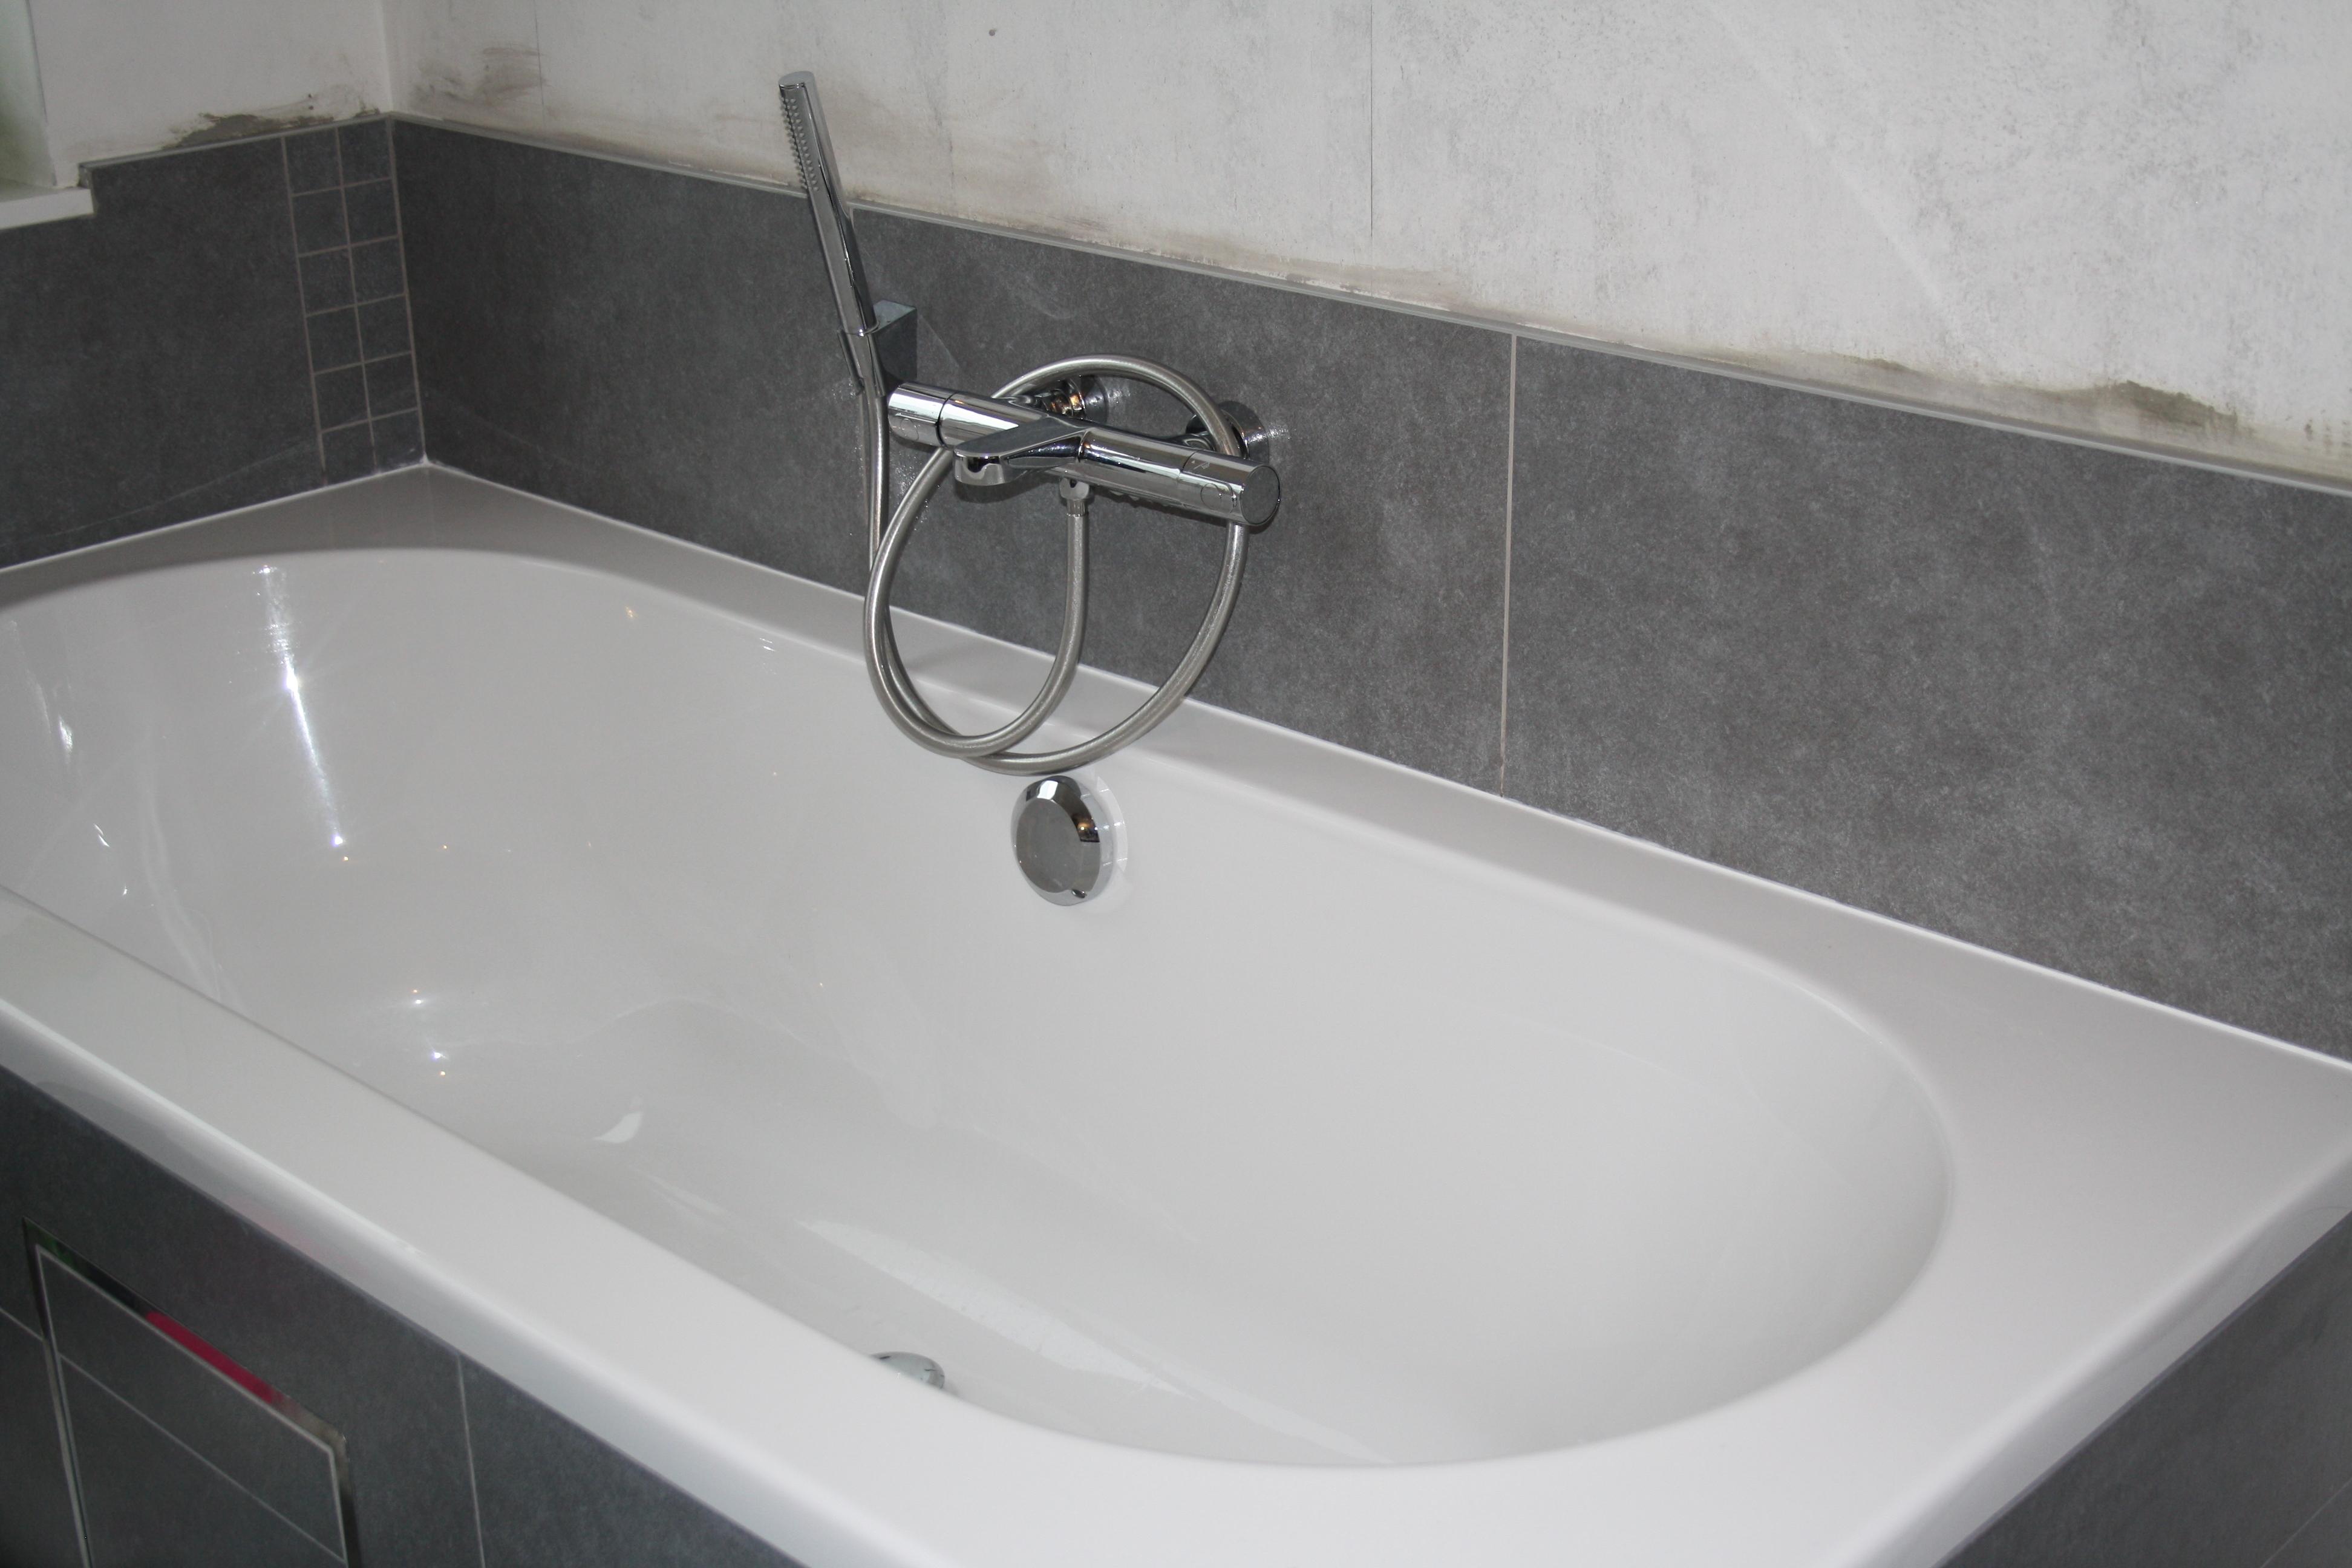 E Bad Sanitair : Installateur elektriciteit domotica elektro sanitair rik